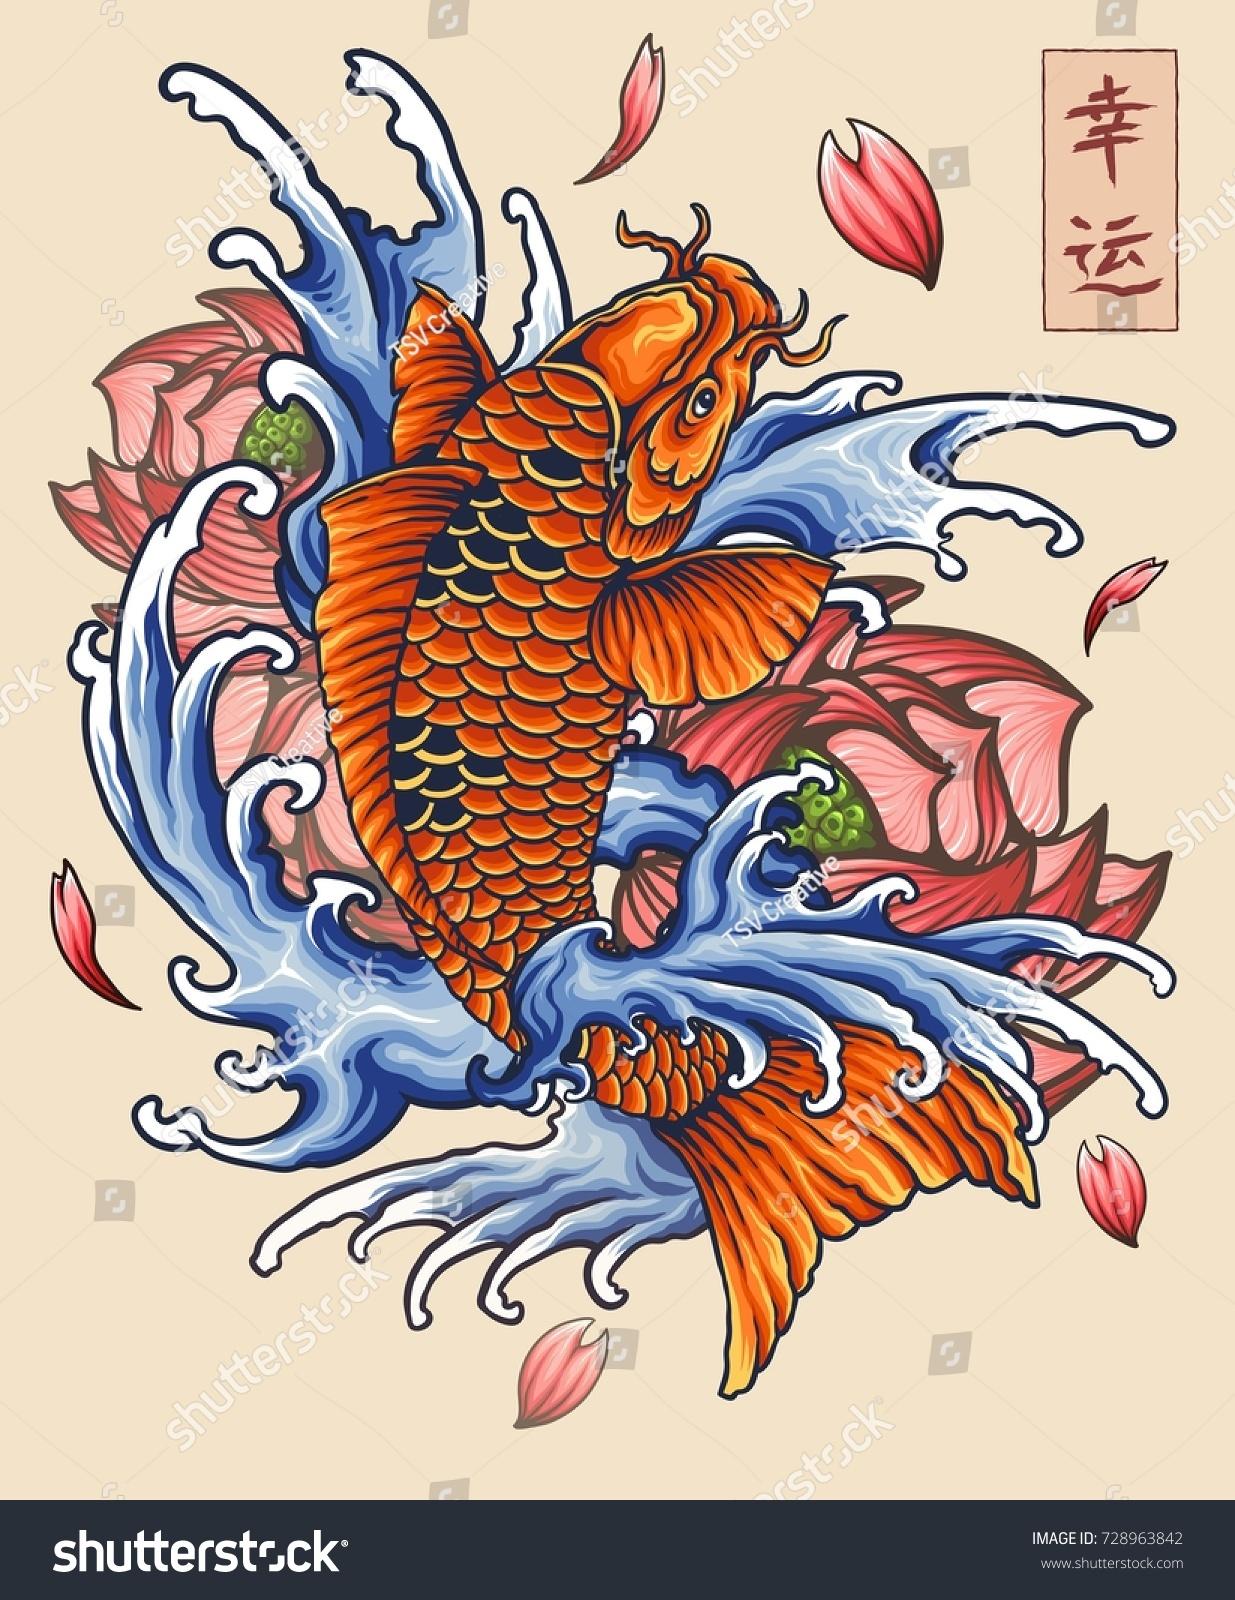 Vector Illustration Japanese Koi Fish Tattoo Stock Vector Royalty Free 728963842